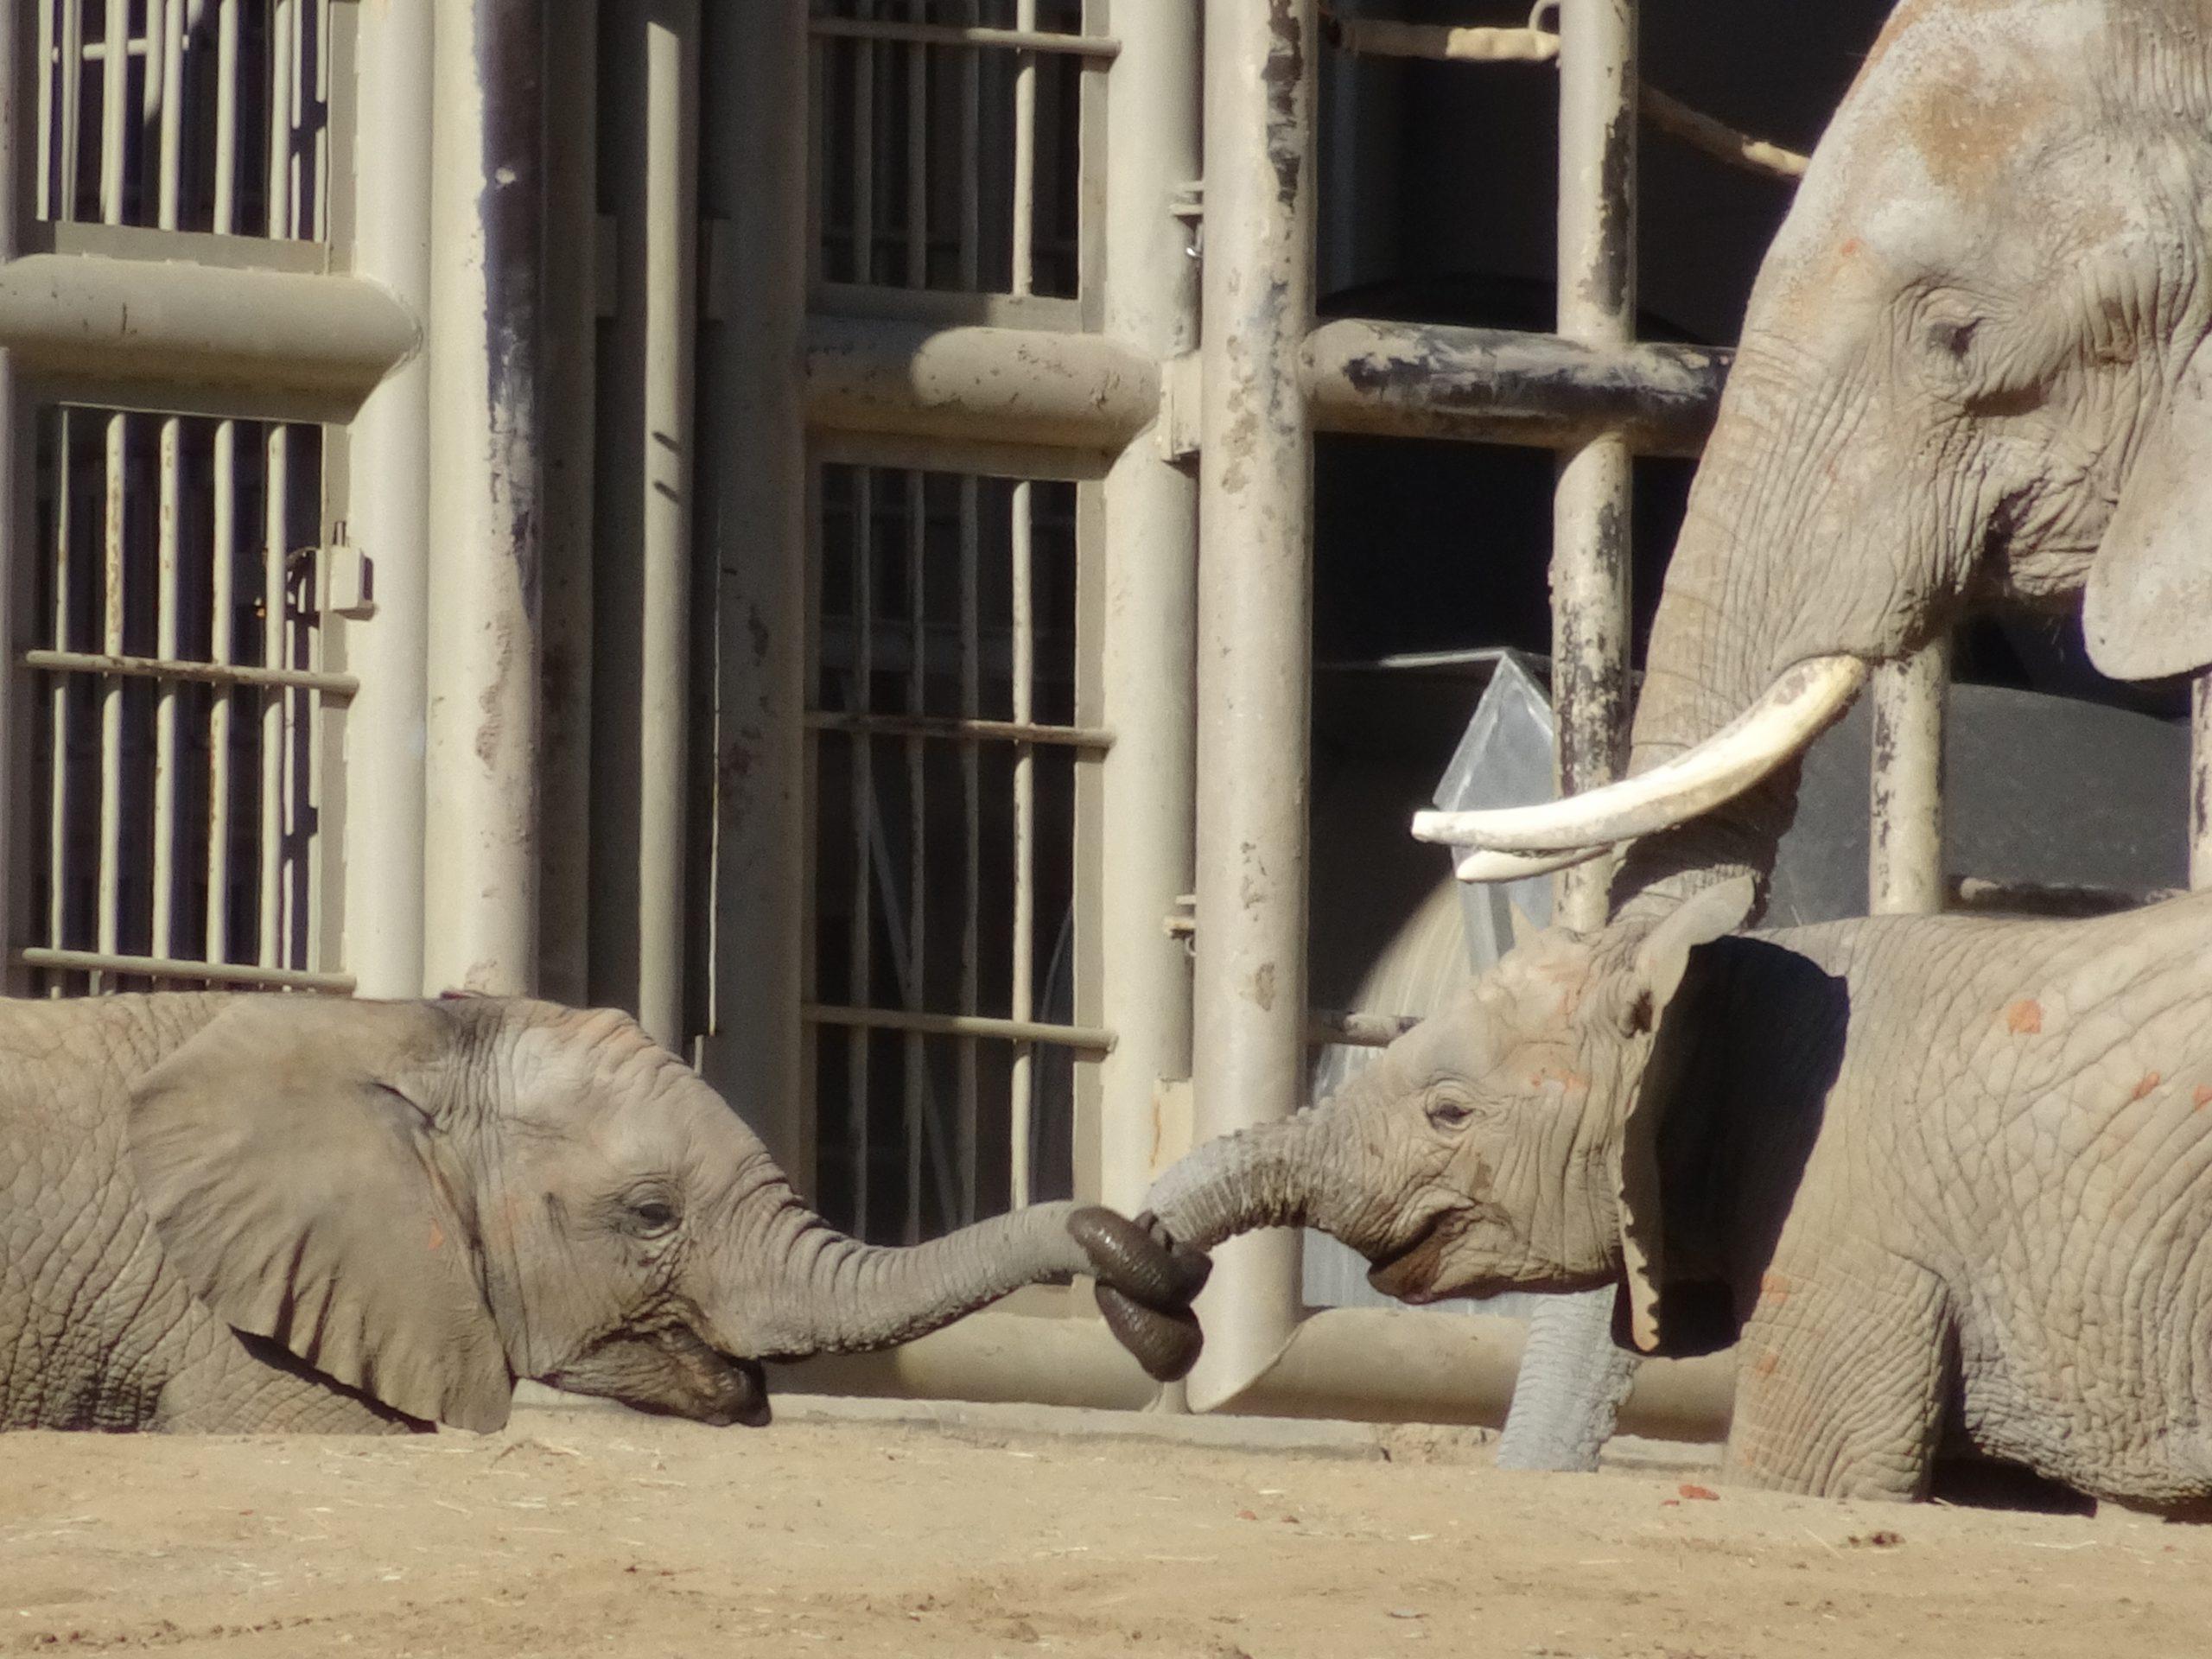 Safari Park Baby Elephants